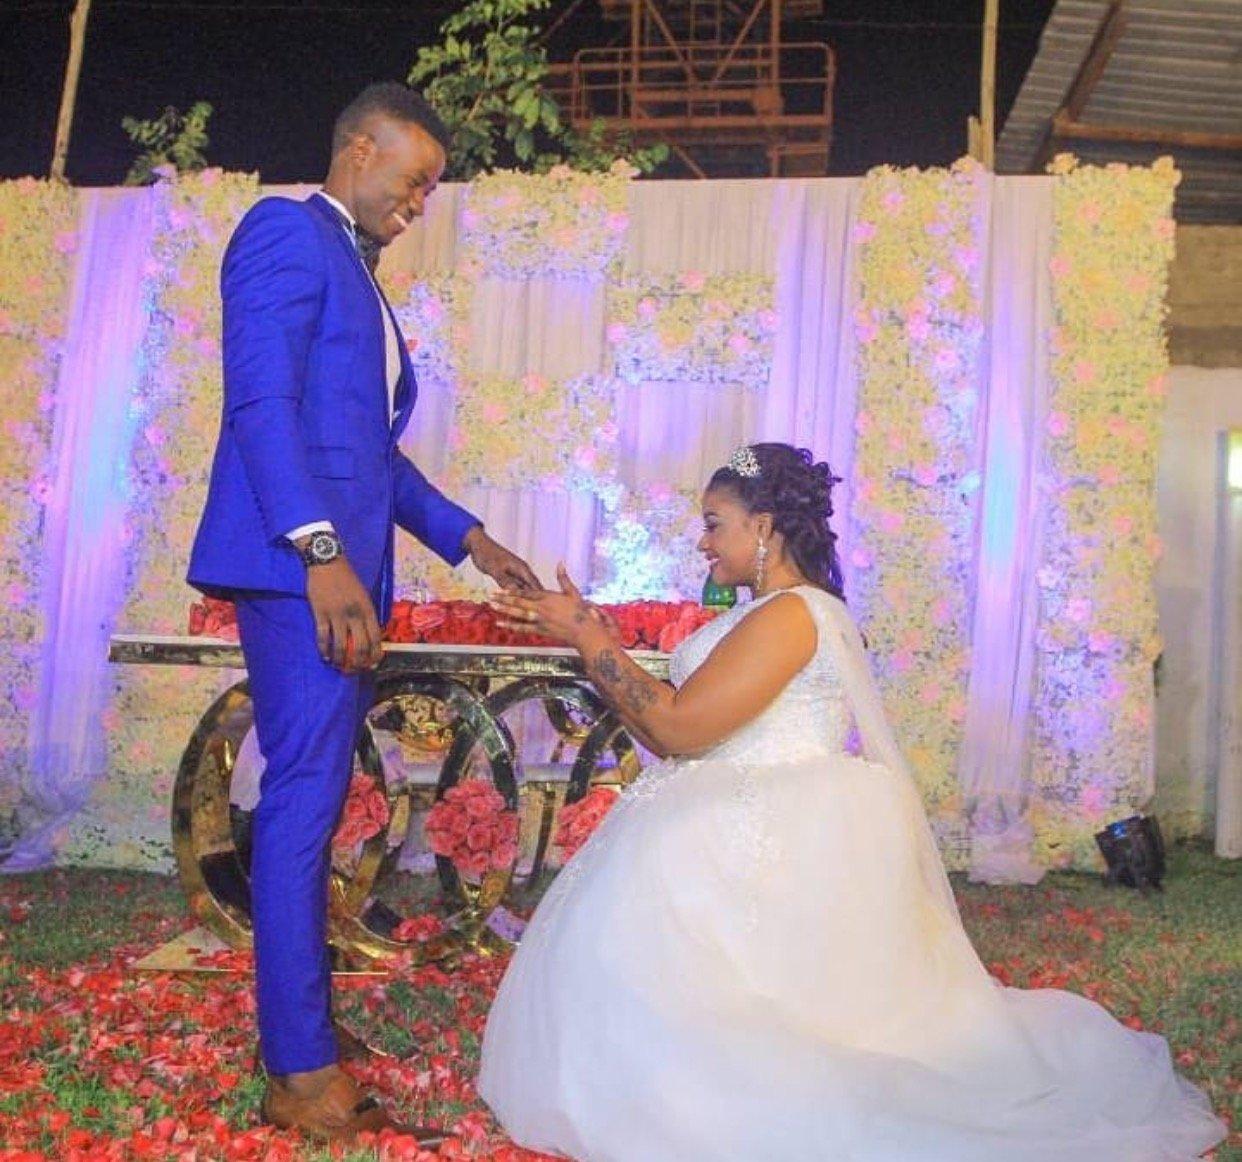 Despite her struggling grammar singer Shilole weds her handsome young man in lavish wedding (Photos)